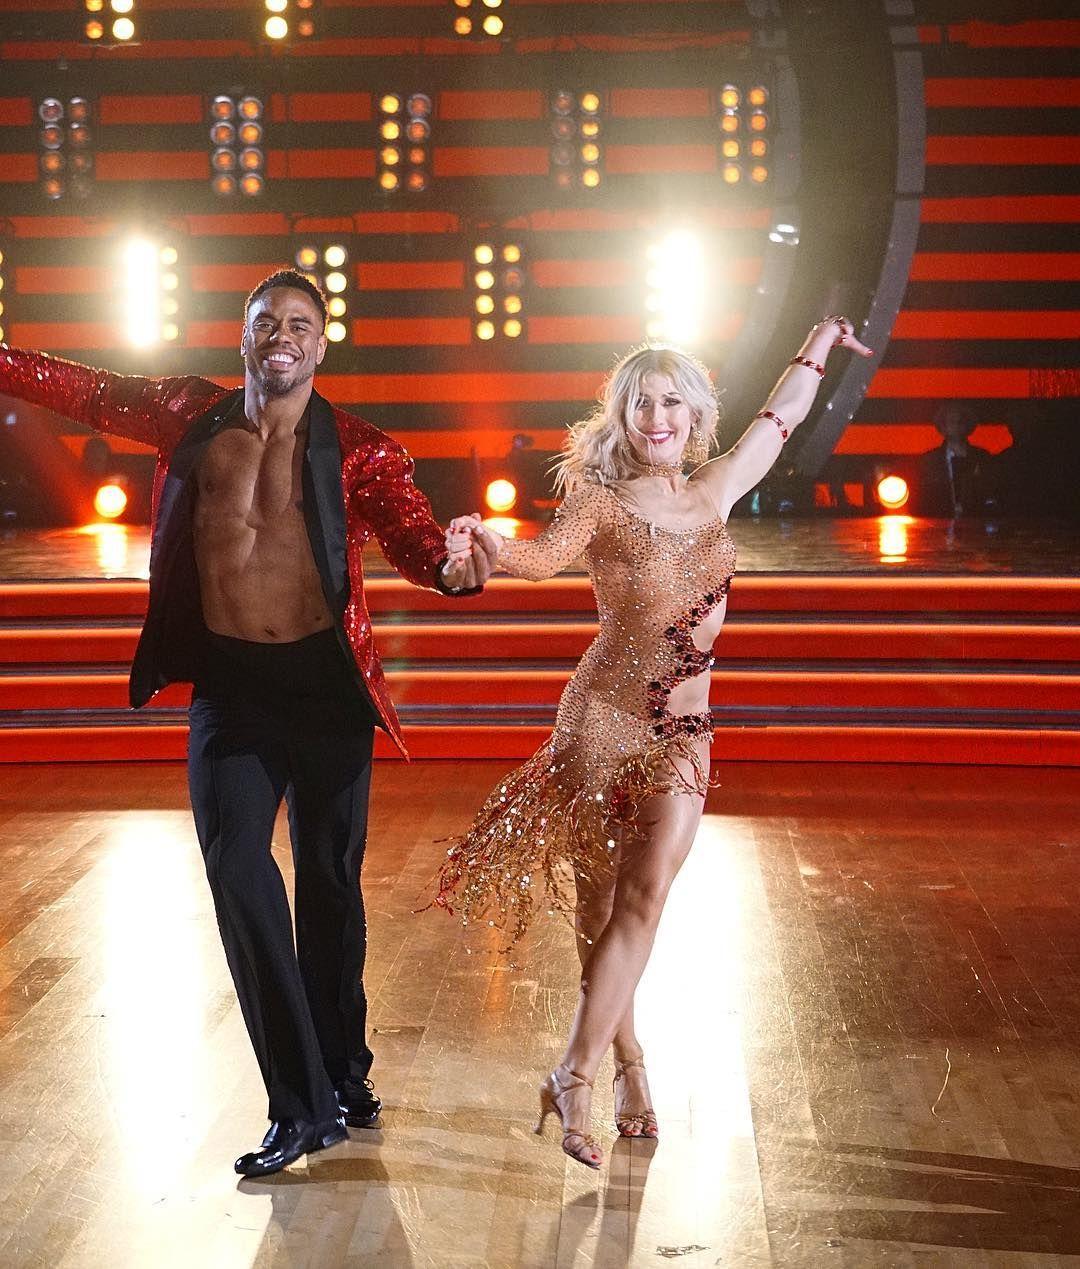 'Dancing with the Stars' crowns Rashad Jennings and partner Emma Slater Season 24 champions #dancingwiththestars